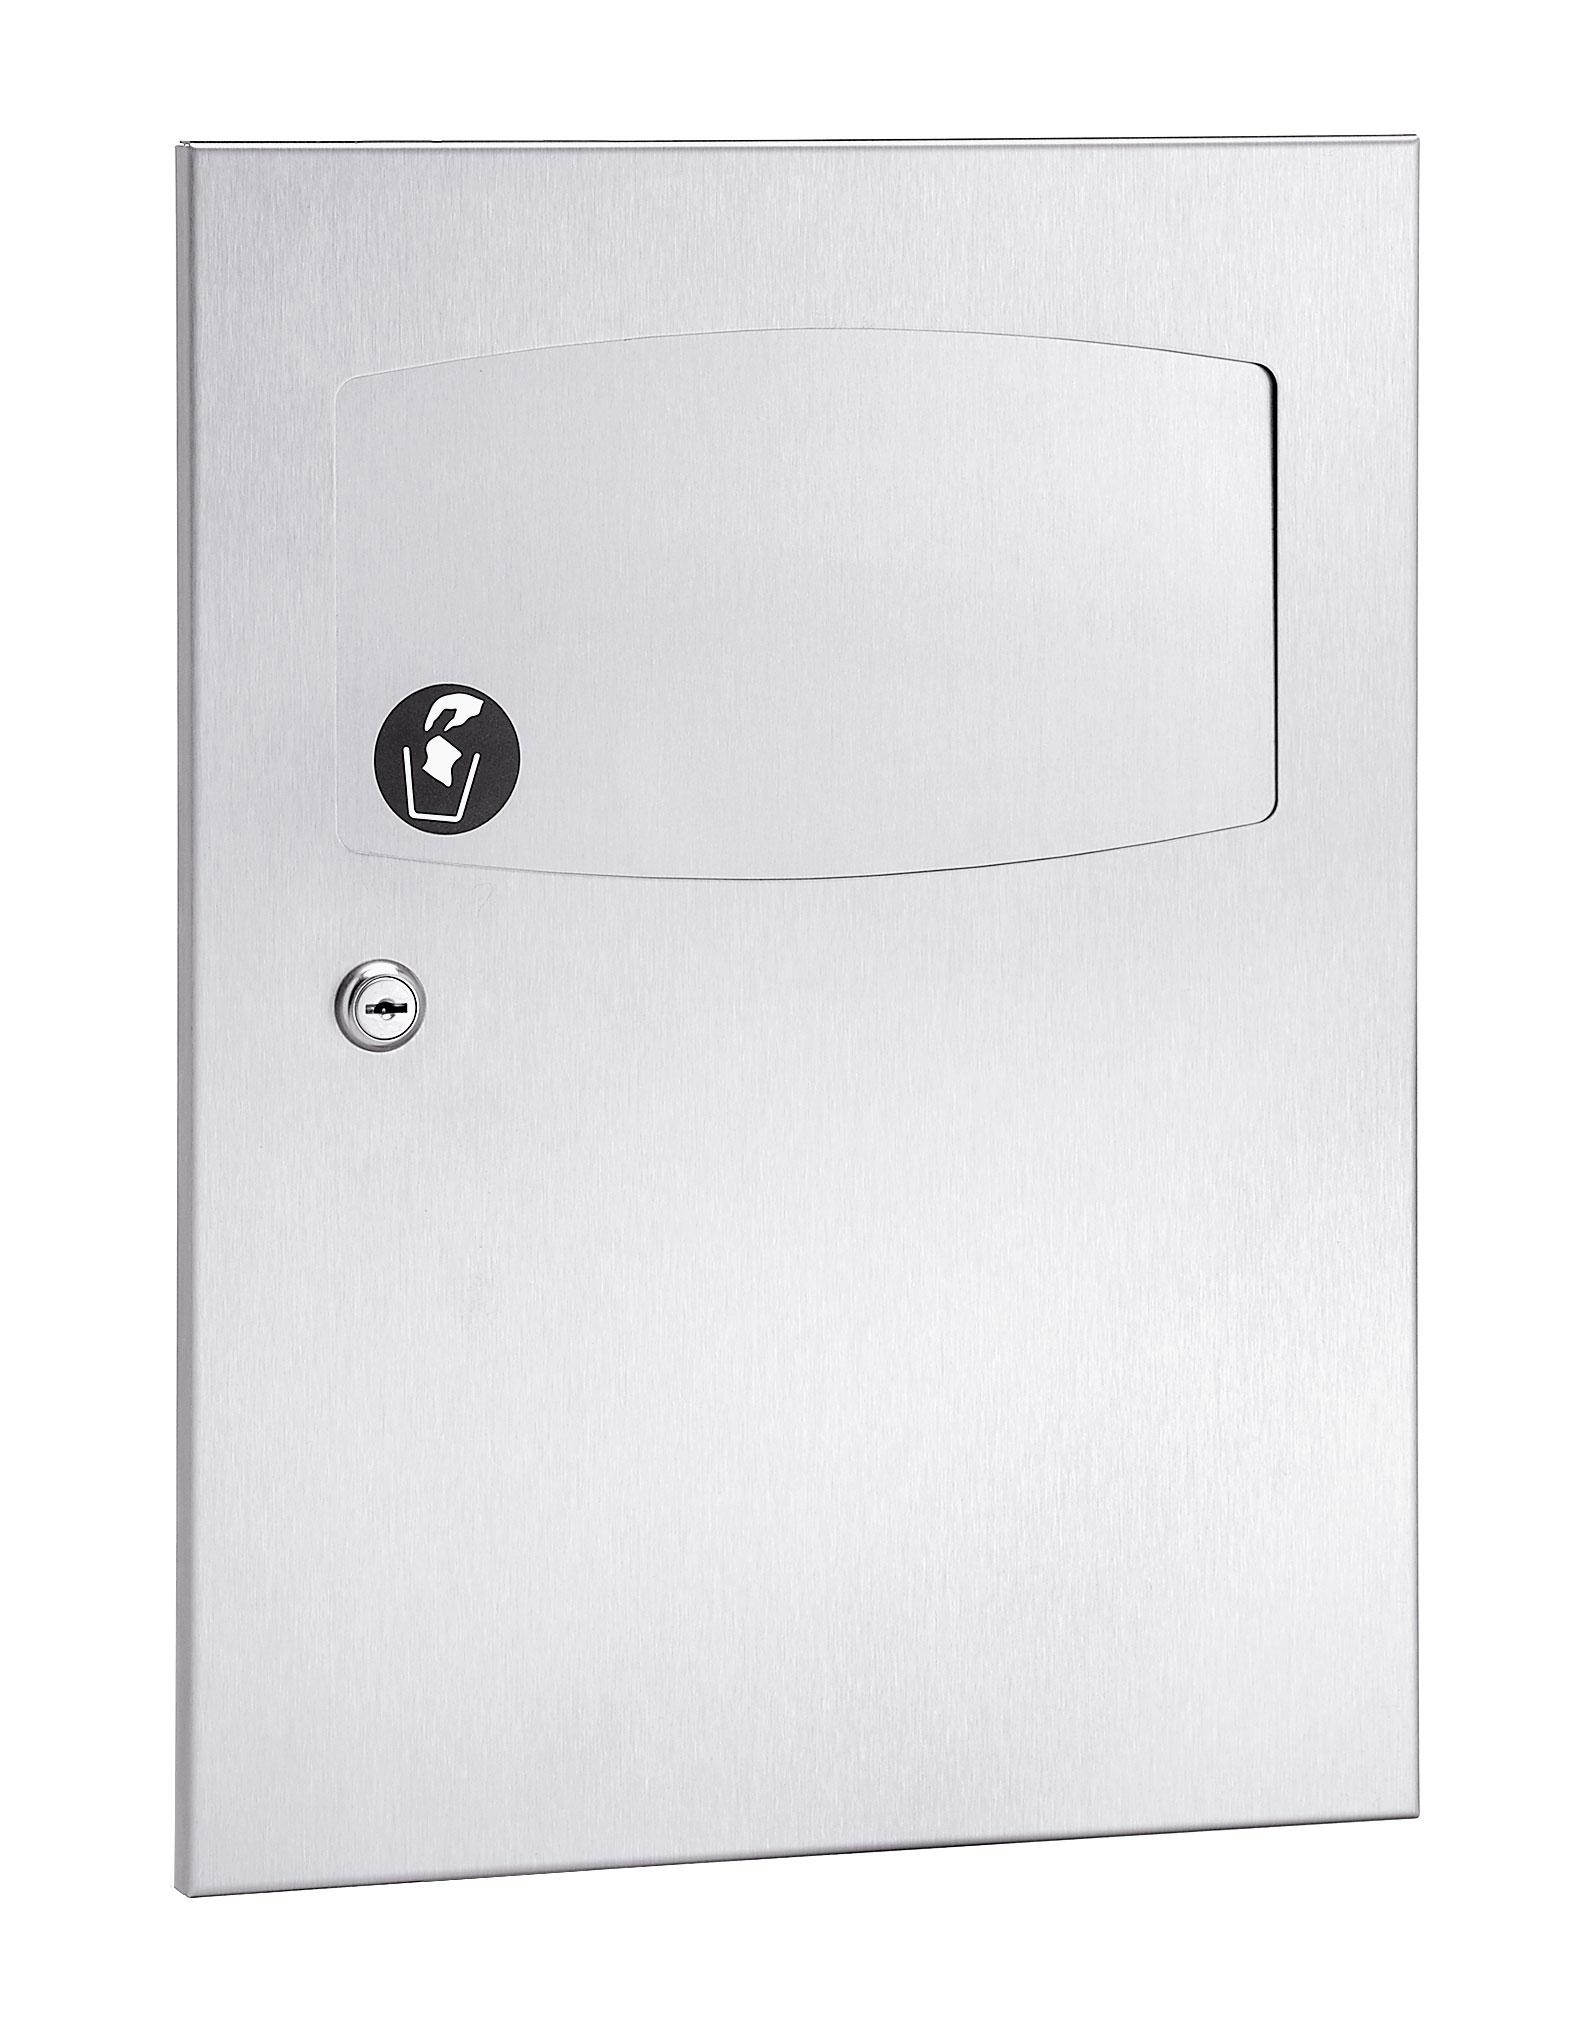 Bradley 4737-10 Semi-Recessed Sanitary Napkin Disposal